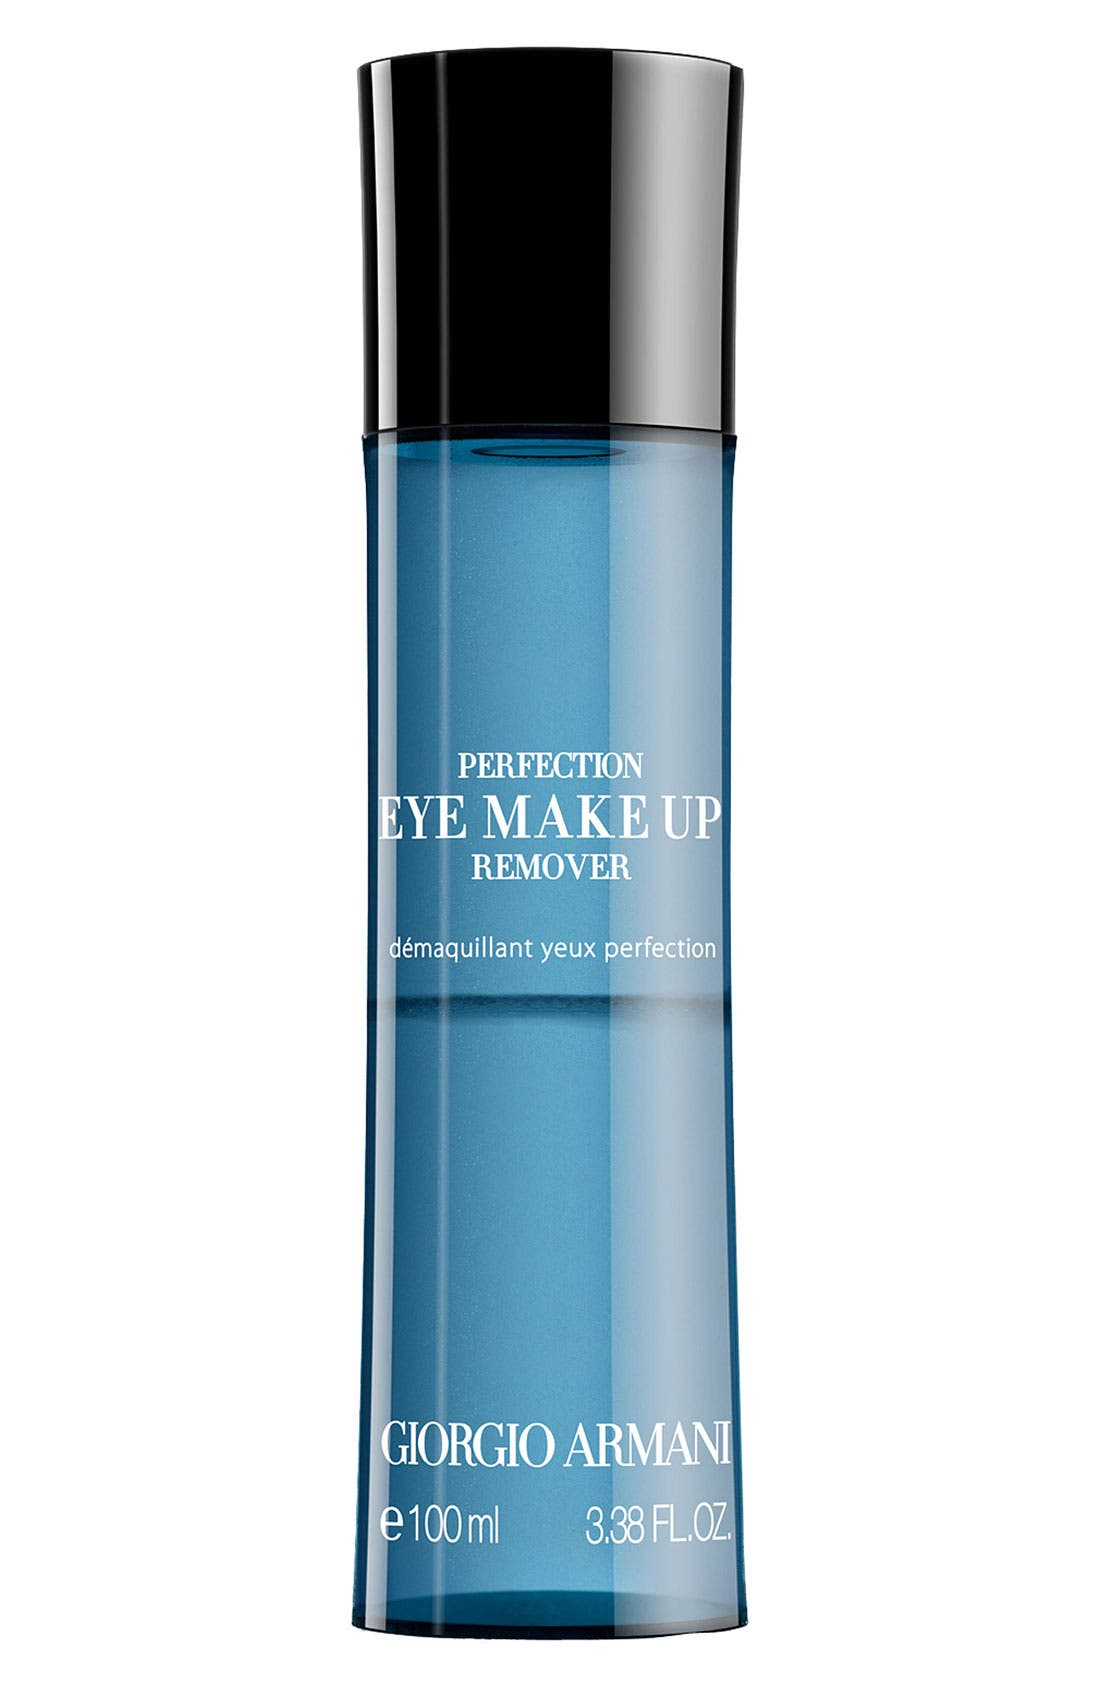 Giorgio Armani 'Perfection' Eye Make-Up Remover